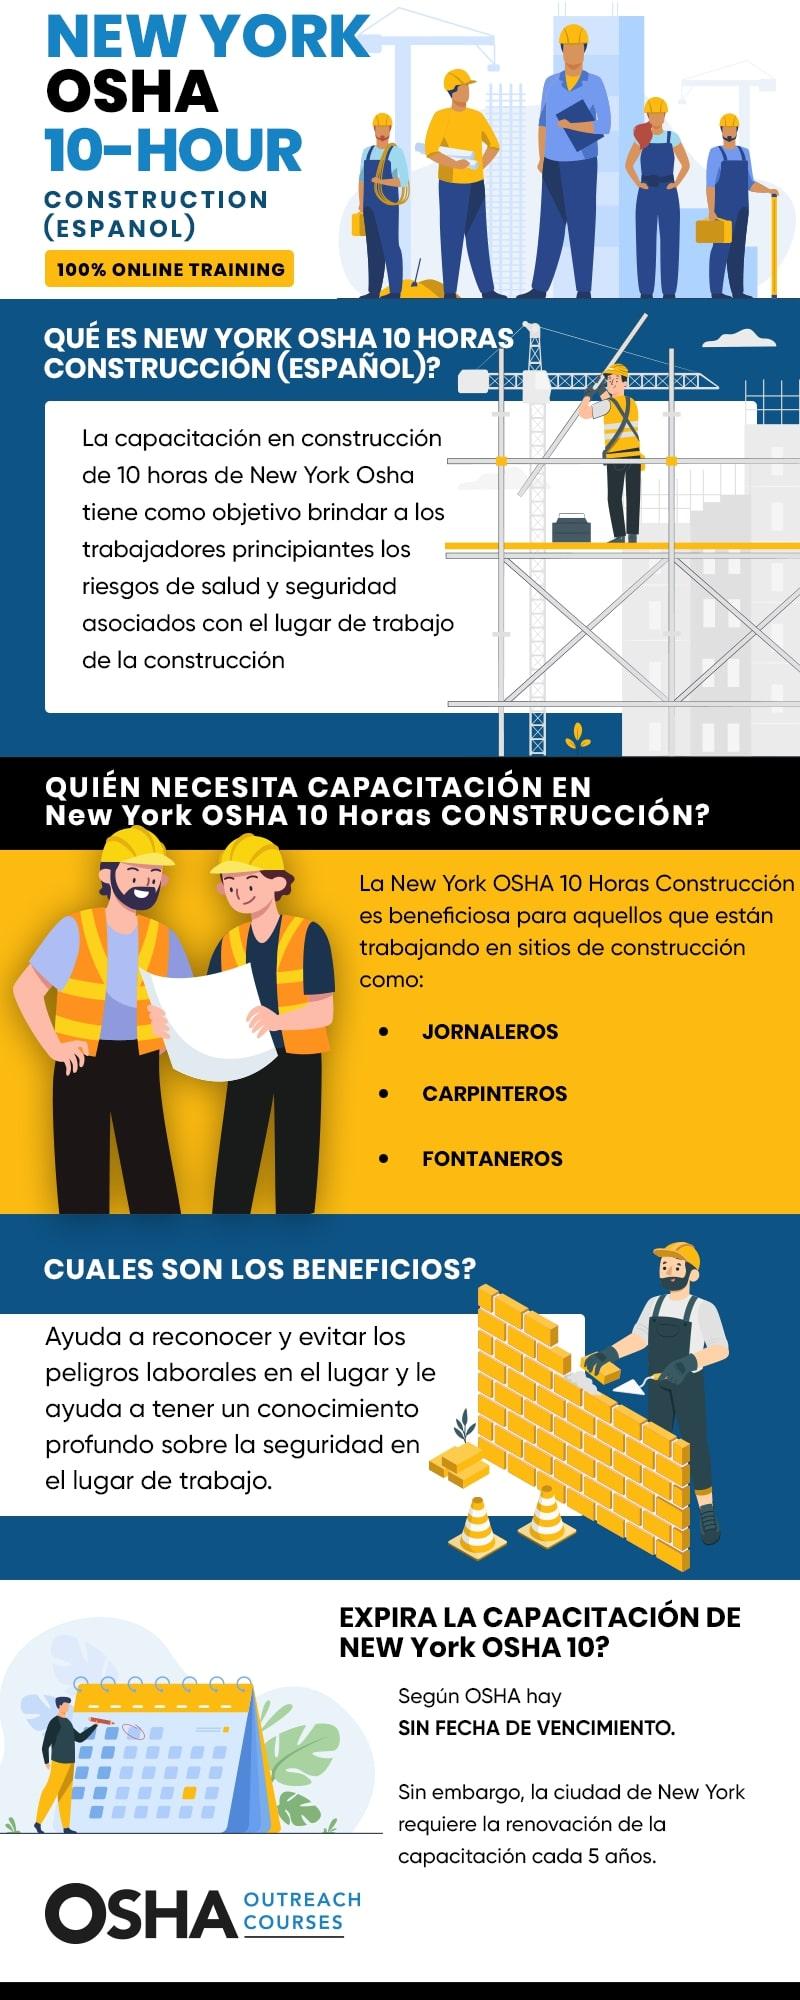 New York OSHA 10 Construction Spanish